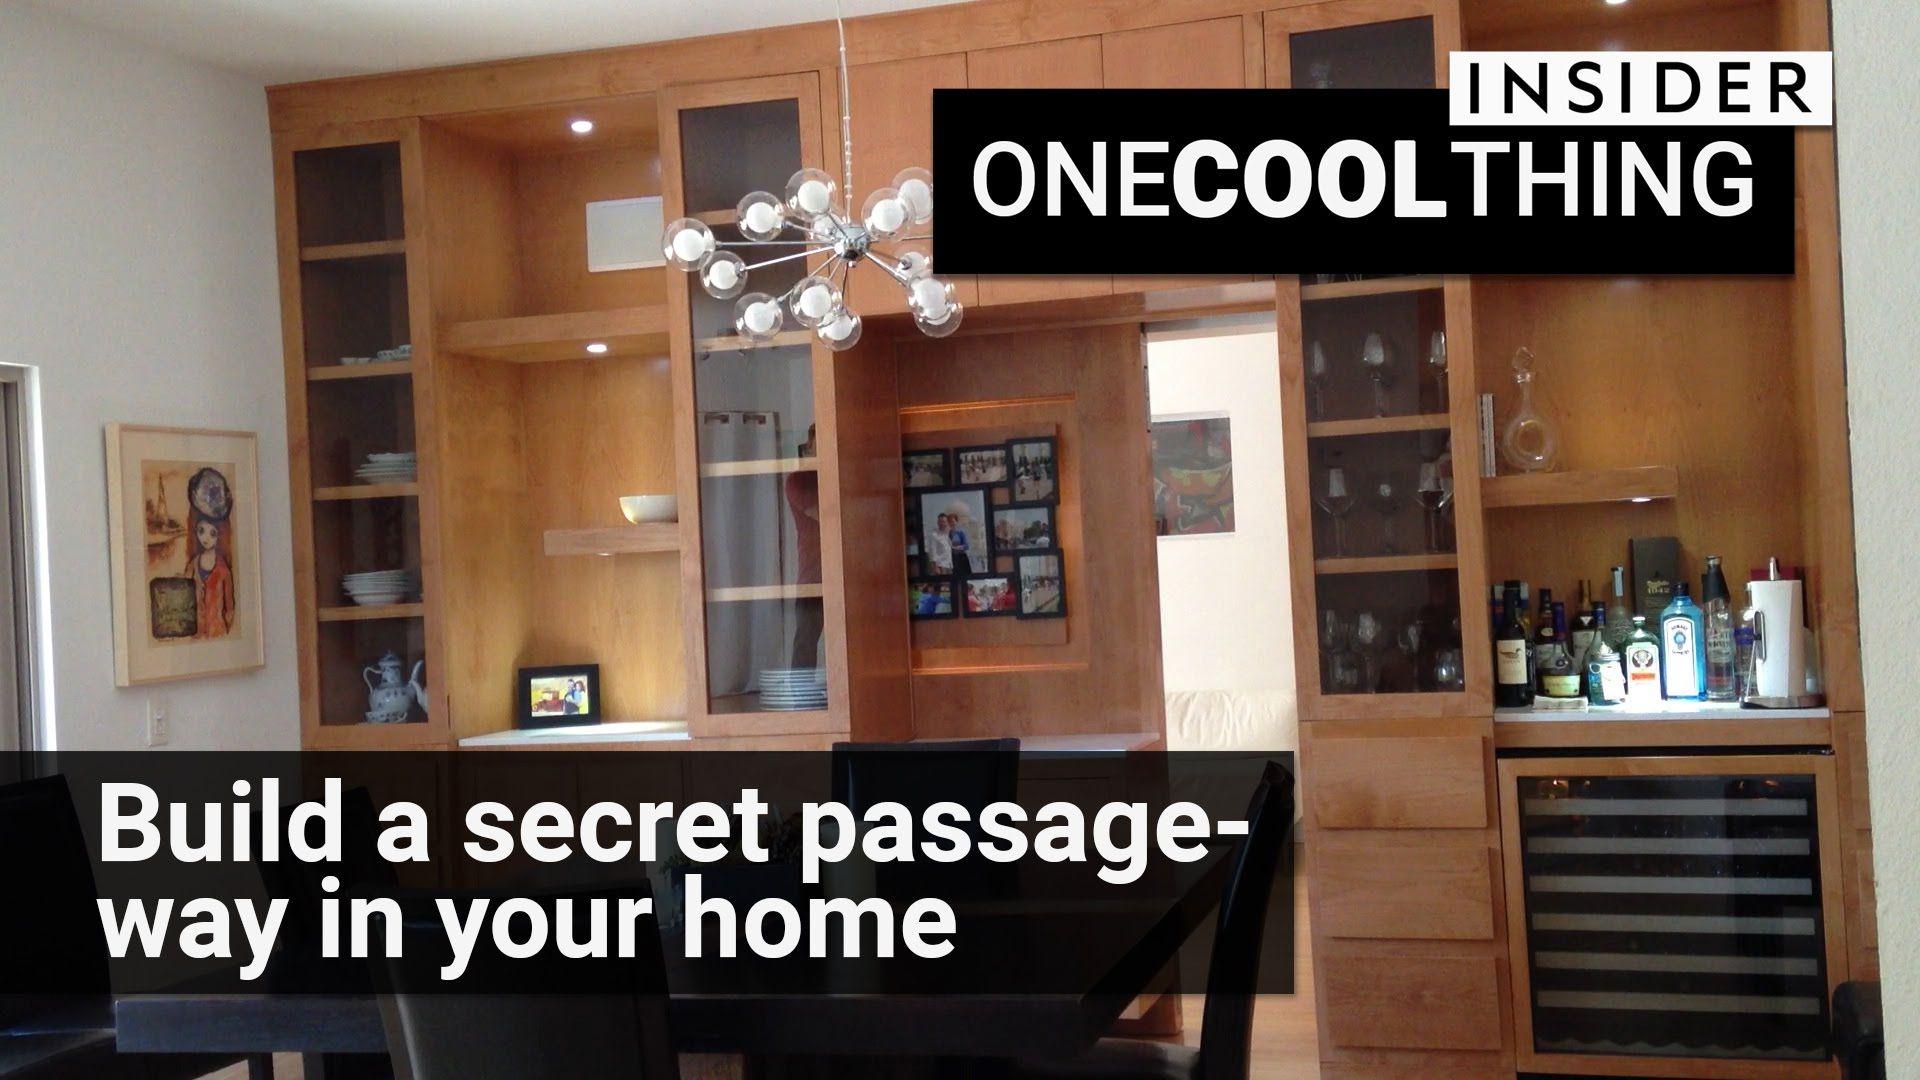 Creative Home Engineering Designs Trap Doors, Secret Rooms, Fake Bookshelves